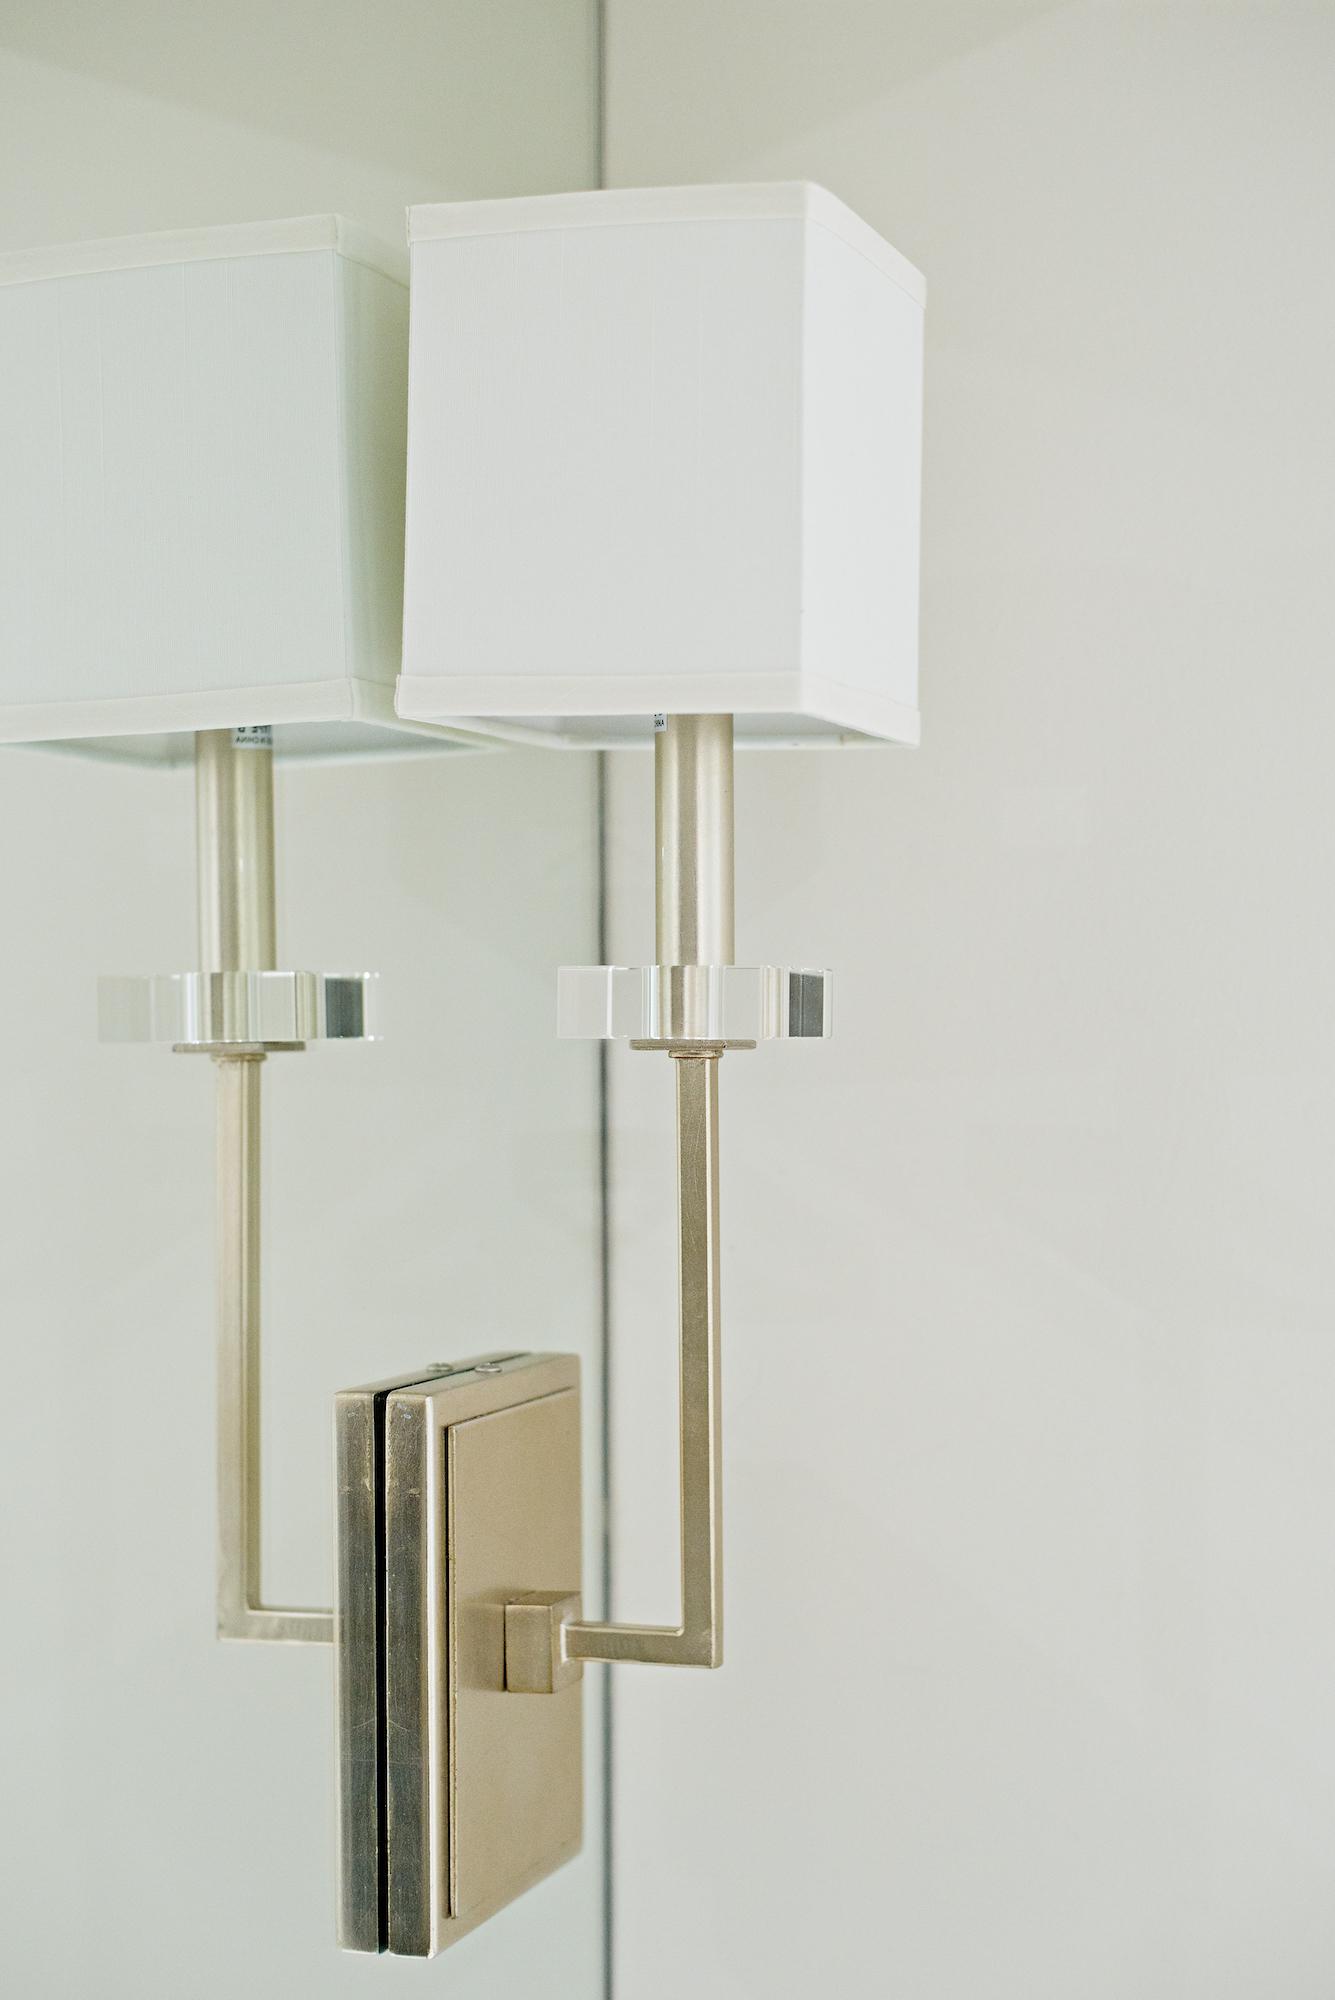 10 Pizzale Design Interior Decorating  bathroom elegant clean simple beige white sconce.jpg